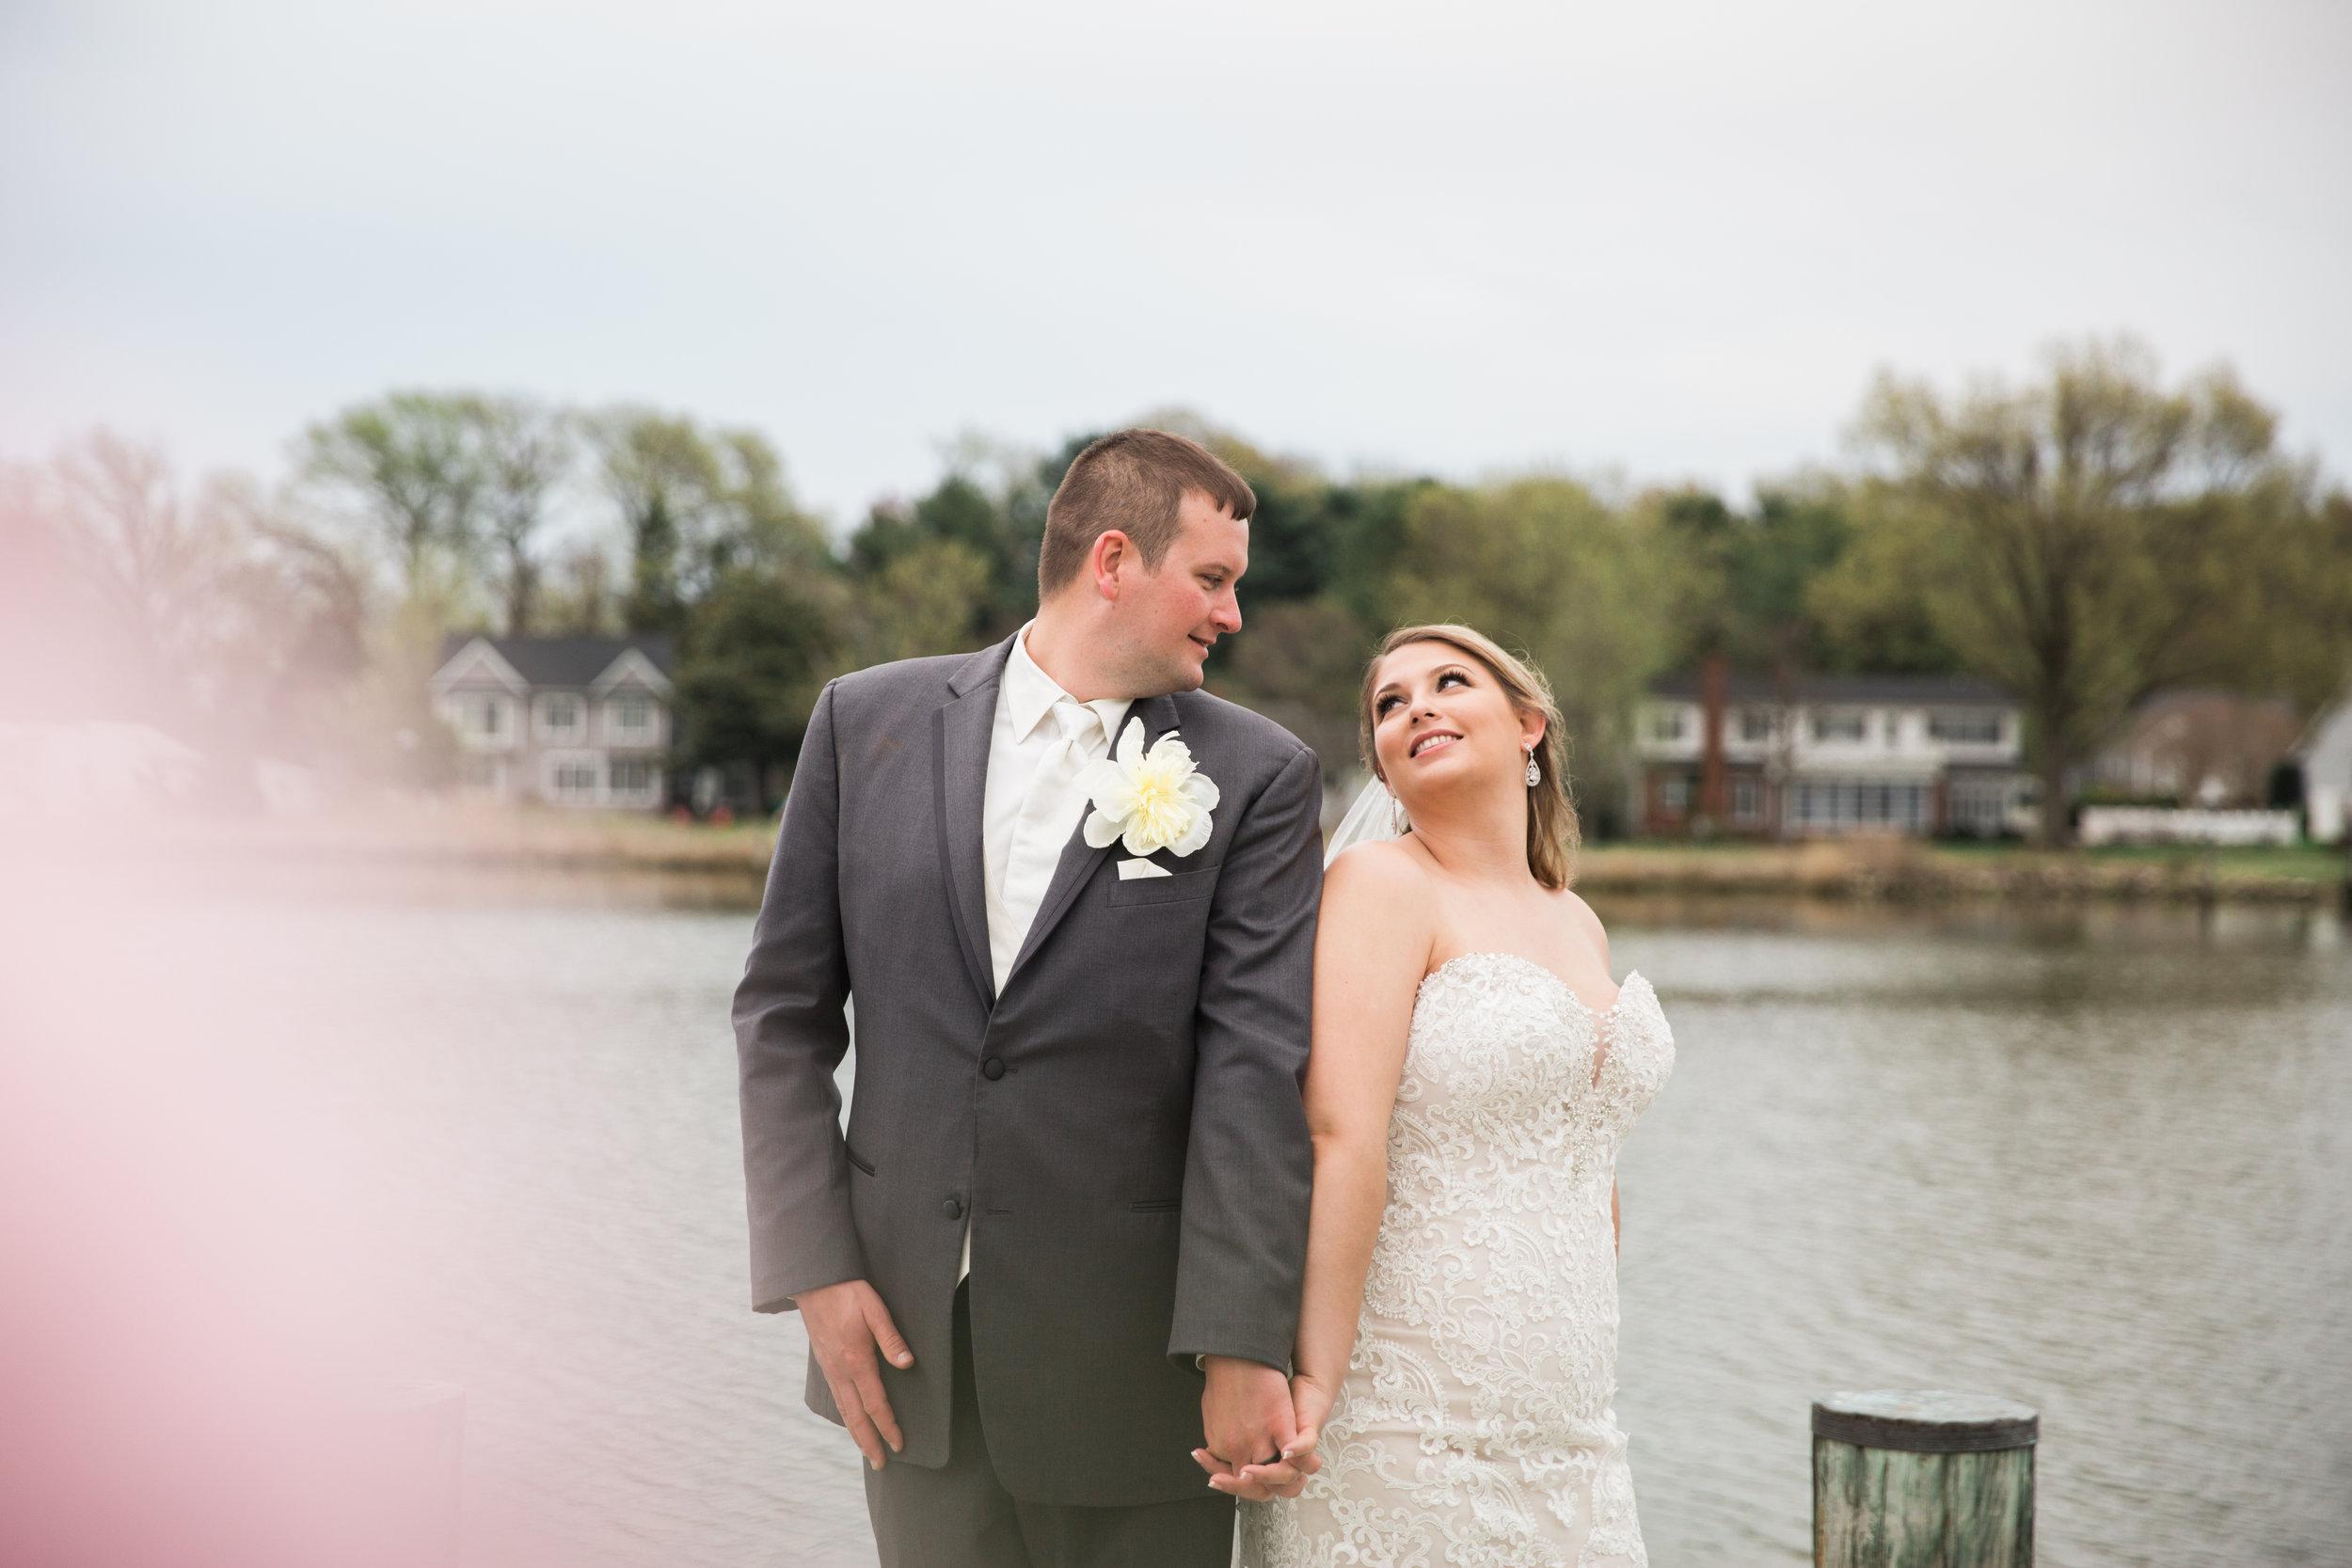 Kent Manor Inn Wedding on Kent Island Maryland Destination Wedding Photographer Megapixels Media  (1 of 71).jpg